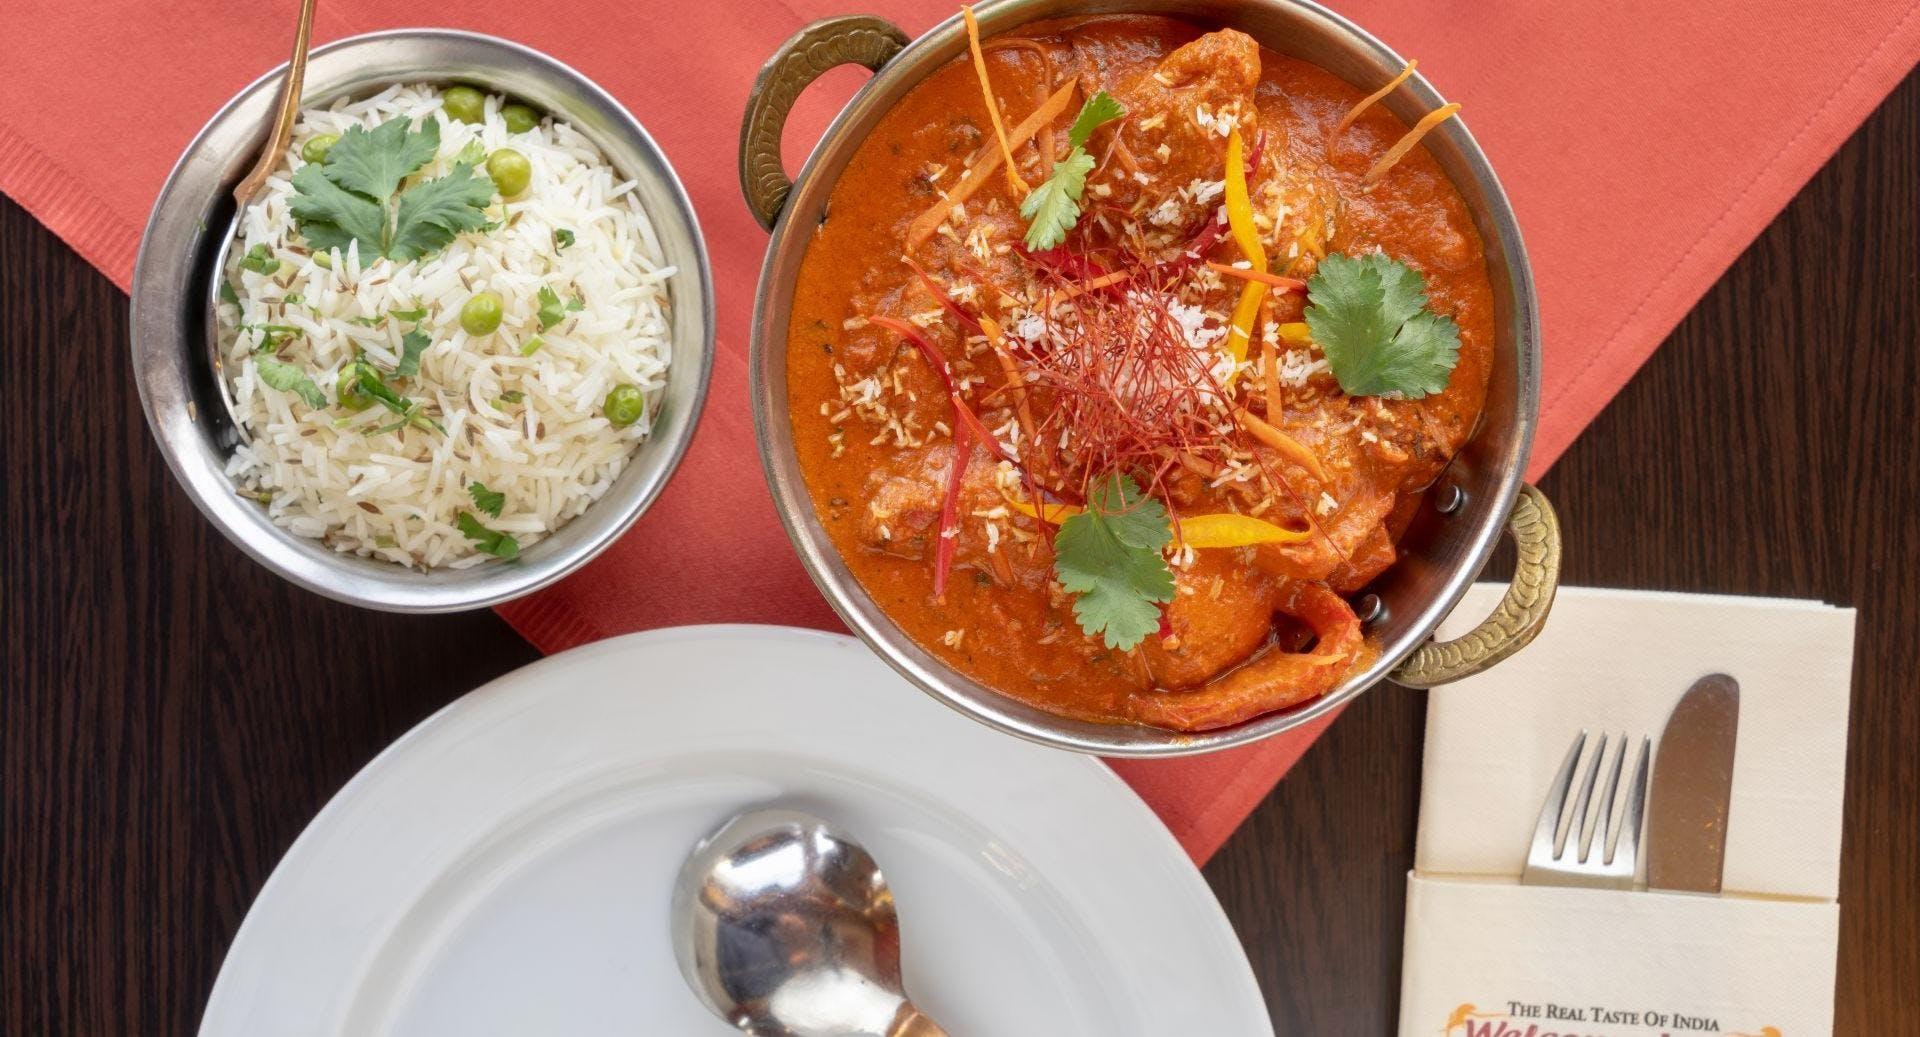 Welcome India Restaurant Hambourg image 3